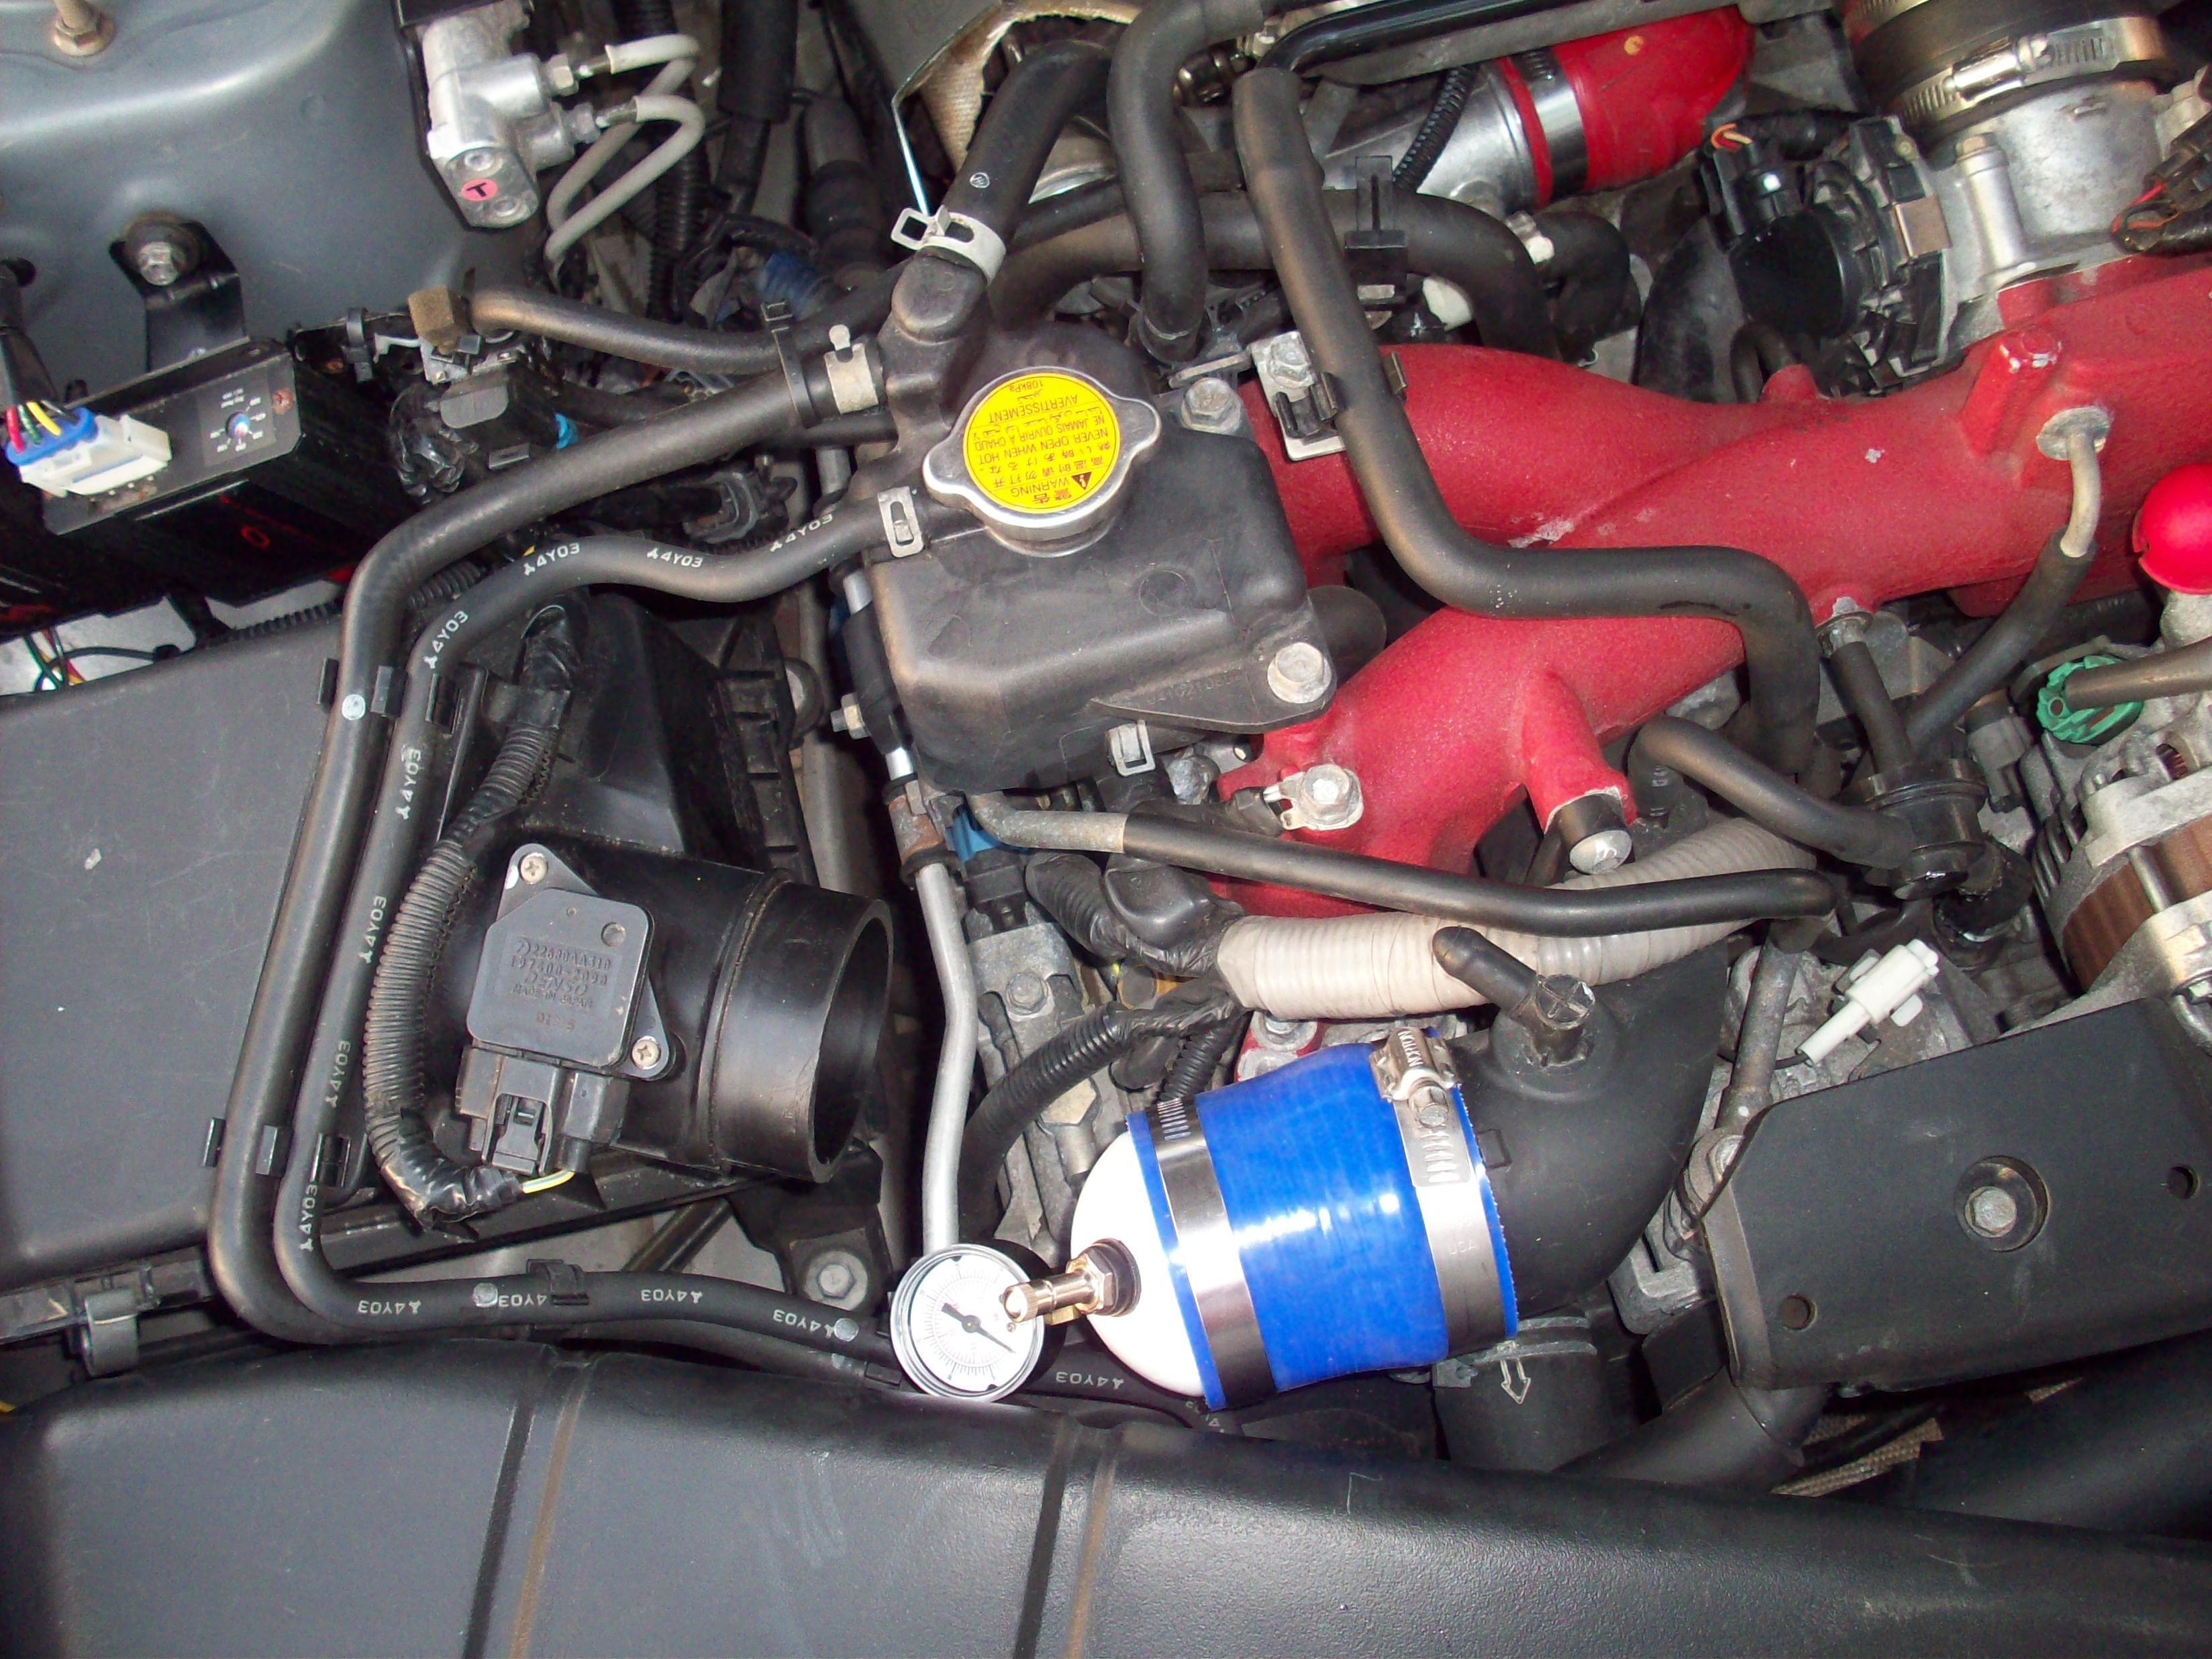 1998 subaru forester engine diagram subaru forester 2005 engine coolant 2000 subaru forester engine diagram 2004 [ 3296 x 2472 Pixel ]